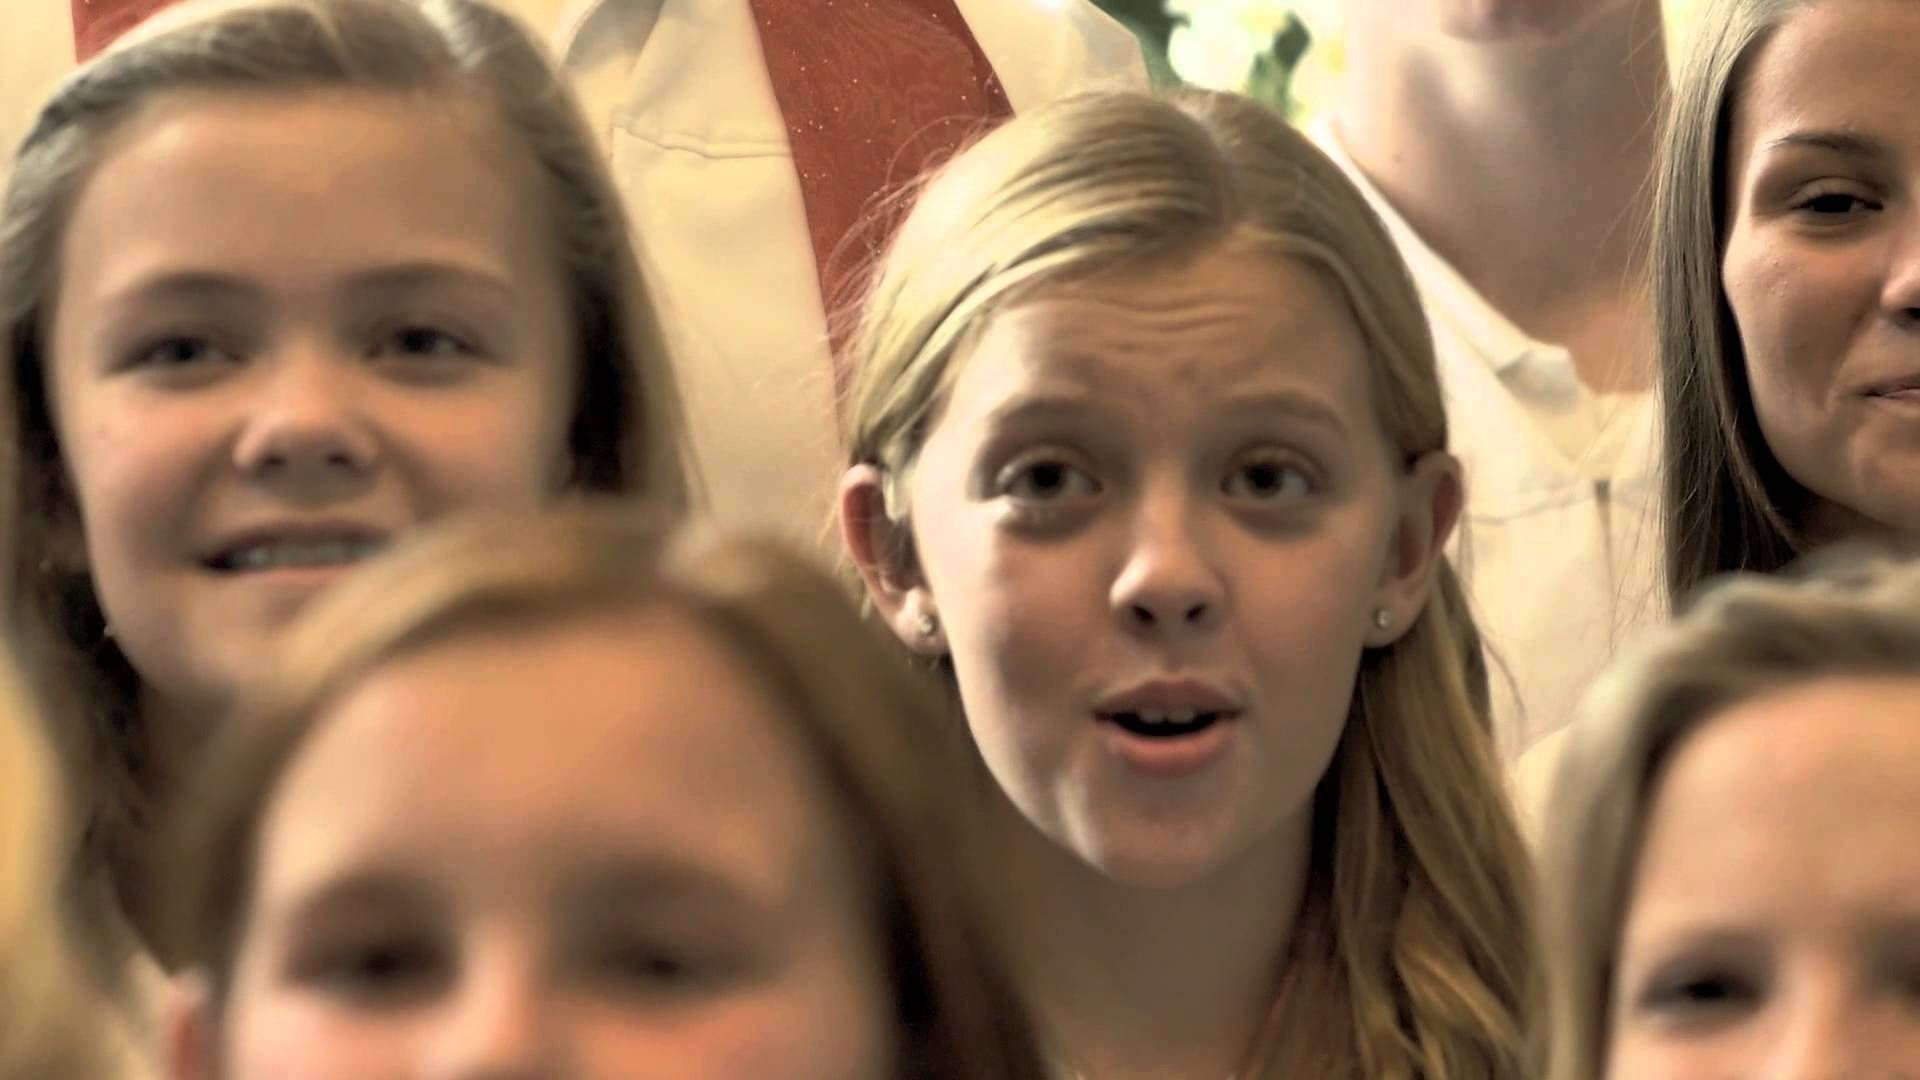 One Voice Children S Choir Performs David Archuleta S Glorious At Millennial Falls In Draper Utah Credits Glori David Archuleta Choir Inspirational Music